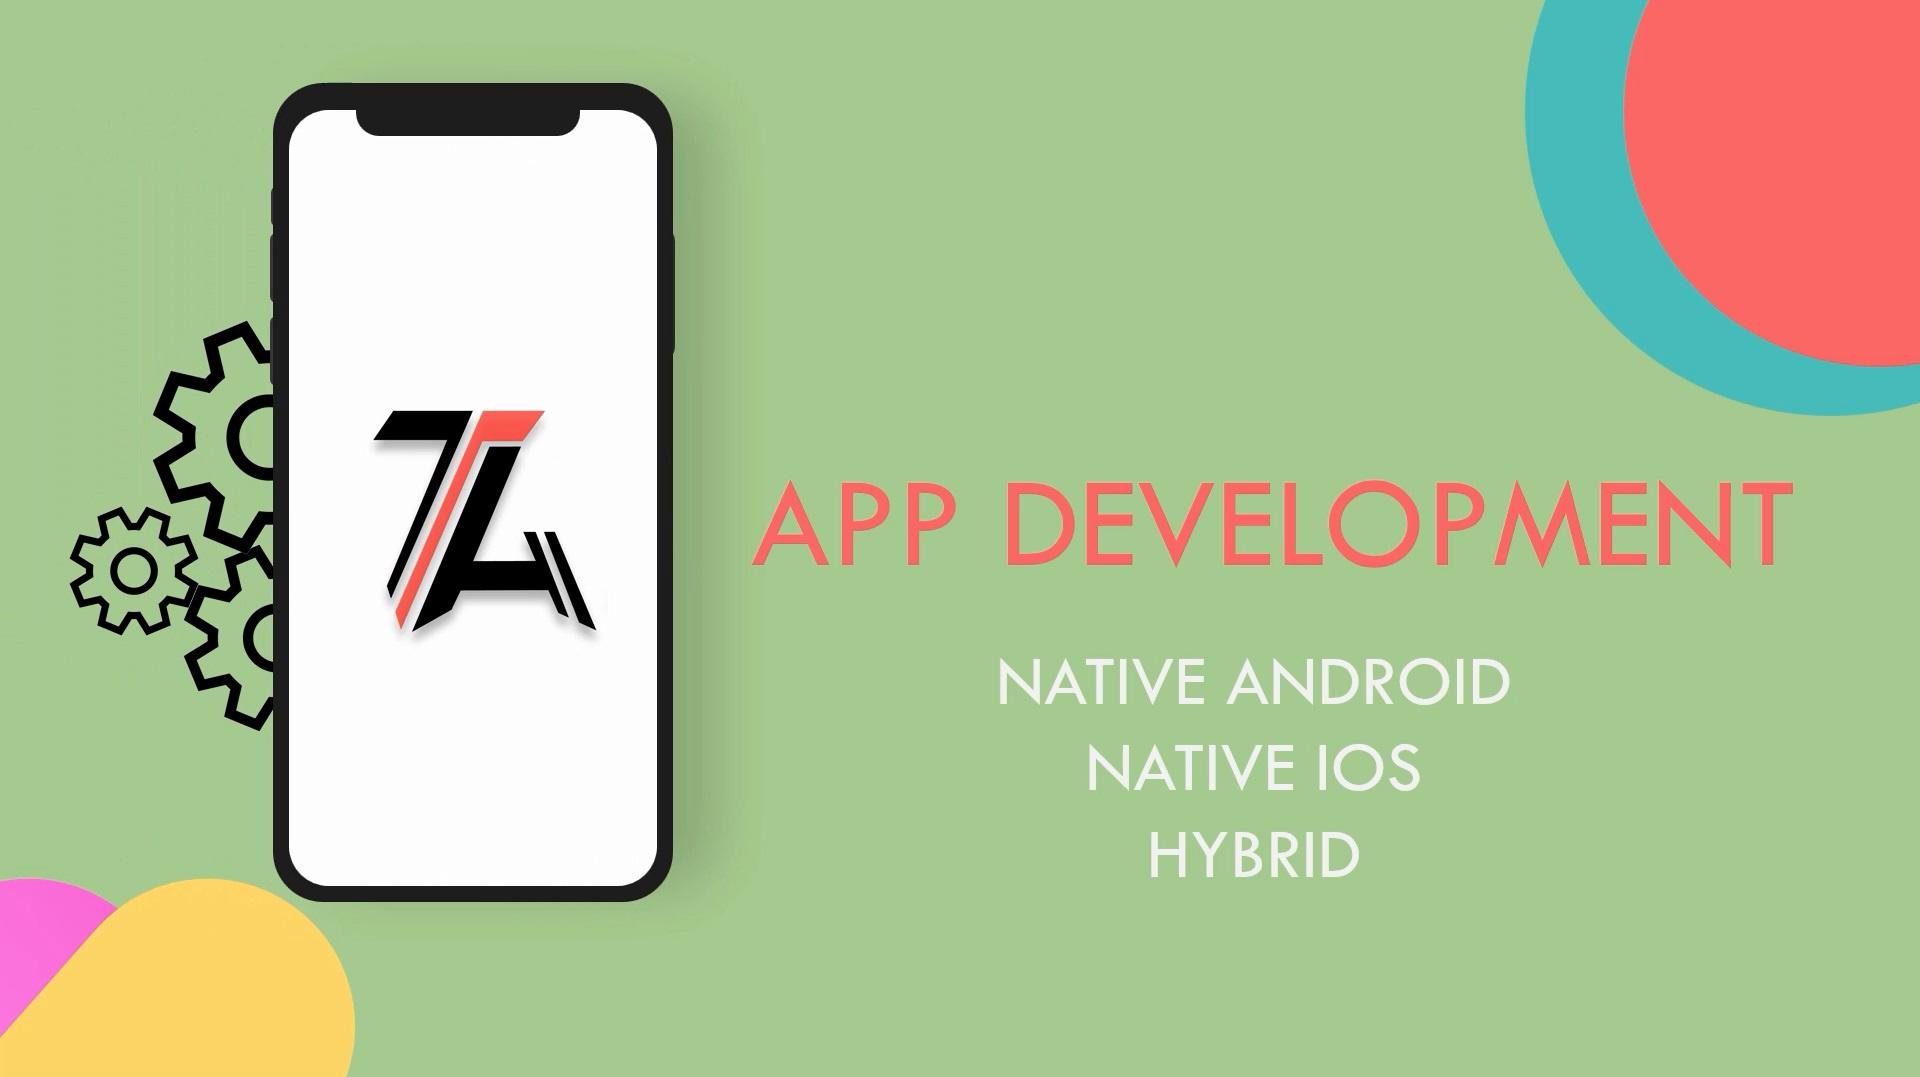 App Development at Techies Atelier